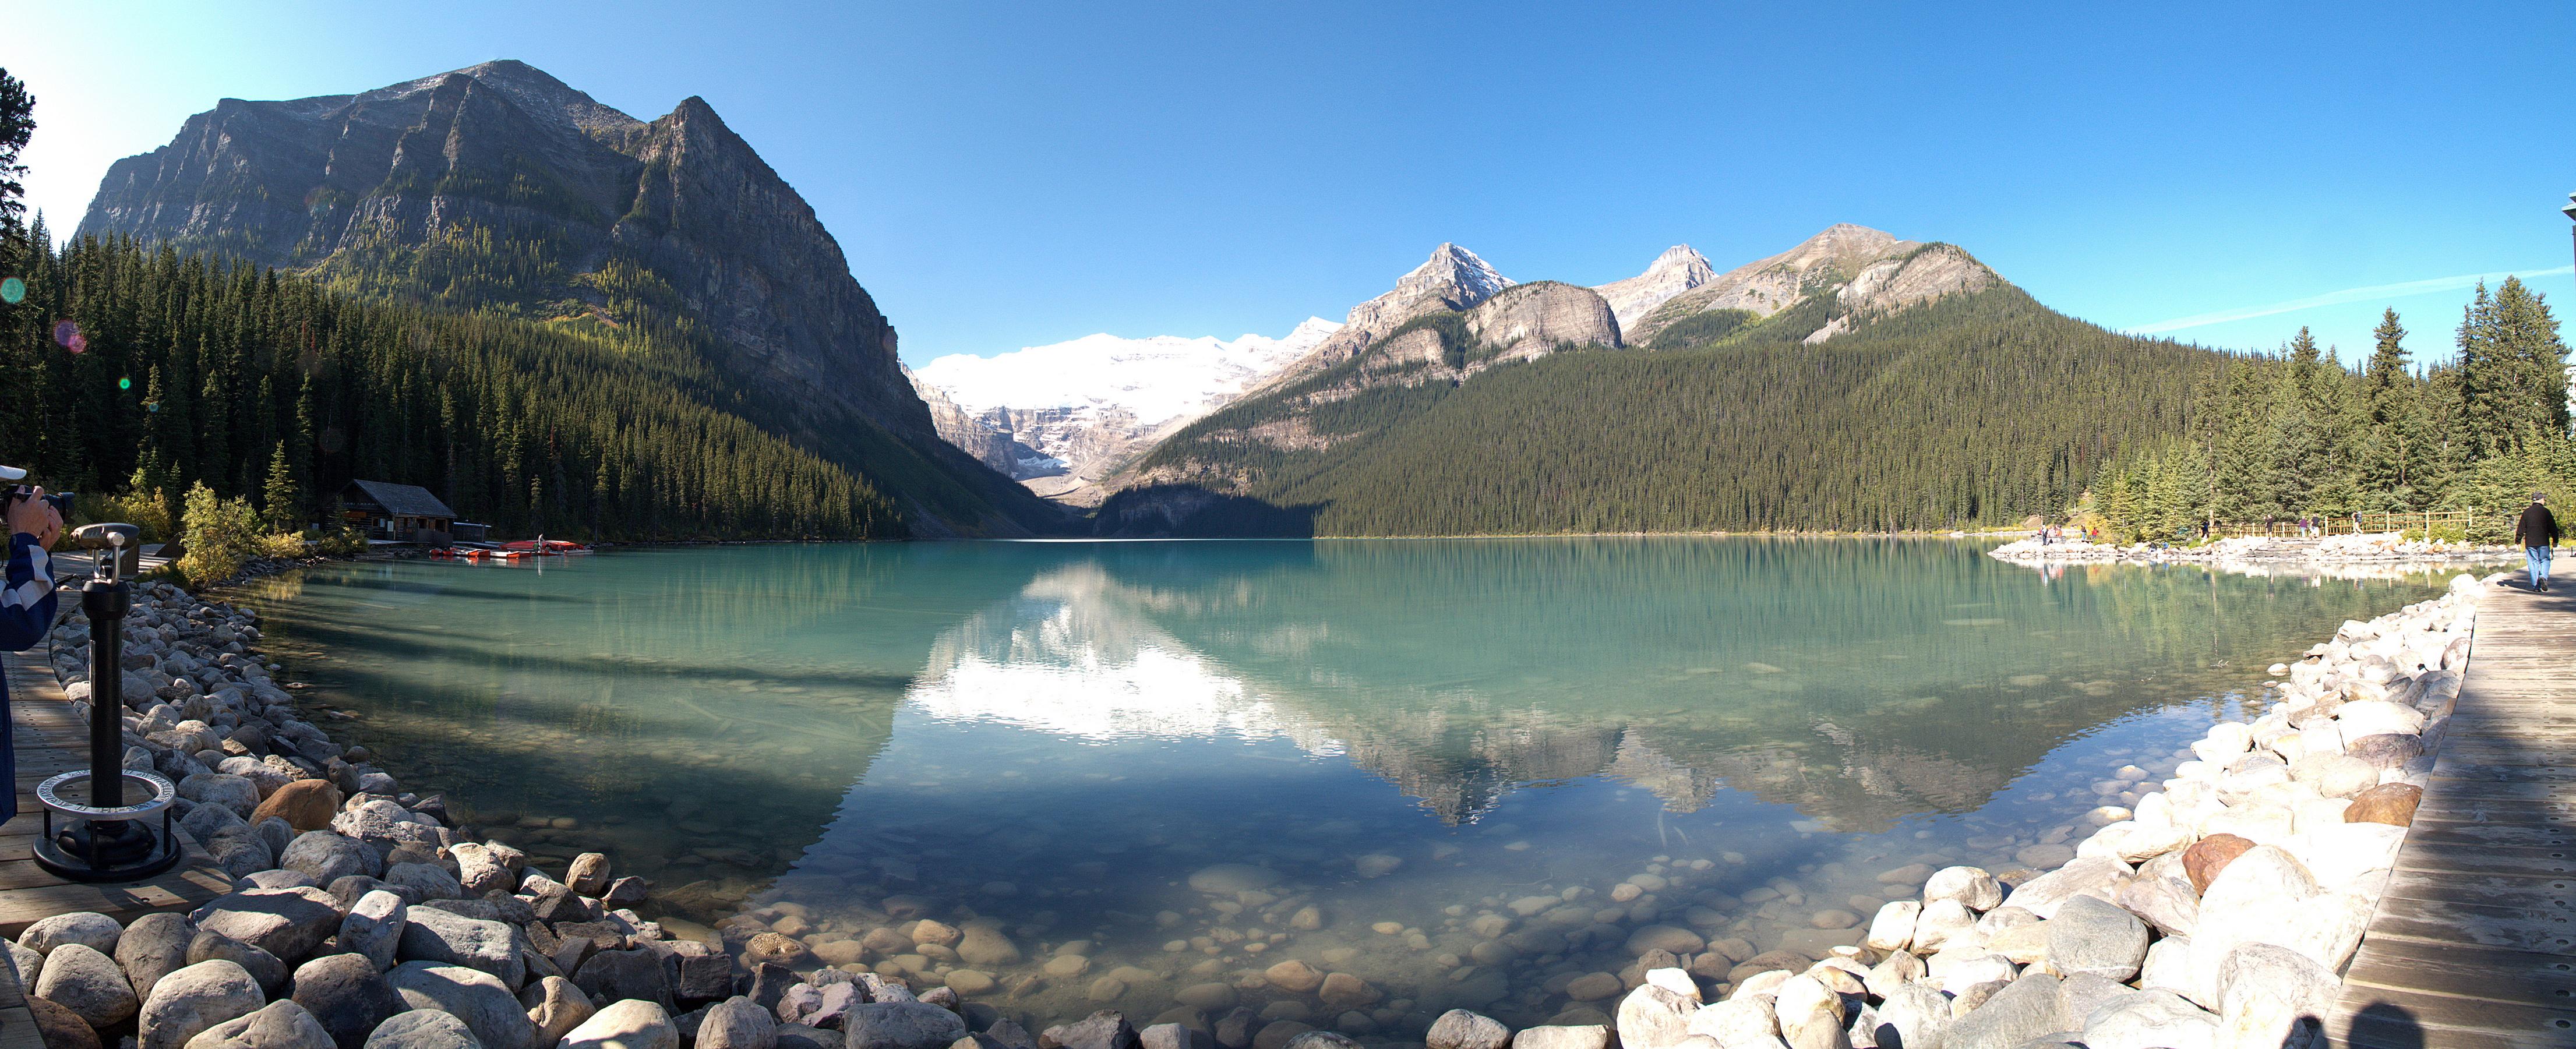 file:alberta - lake louise - lake view 01 - wikimedia commons